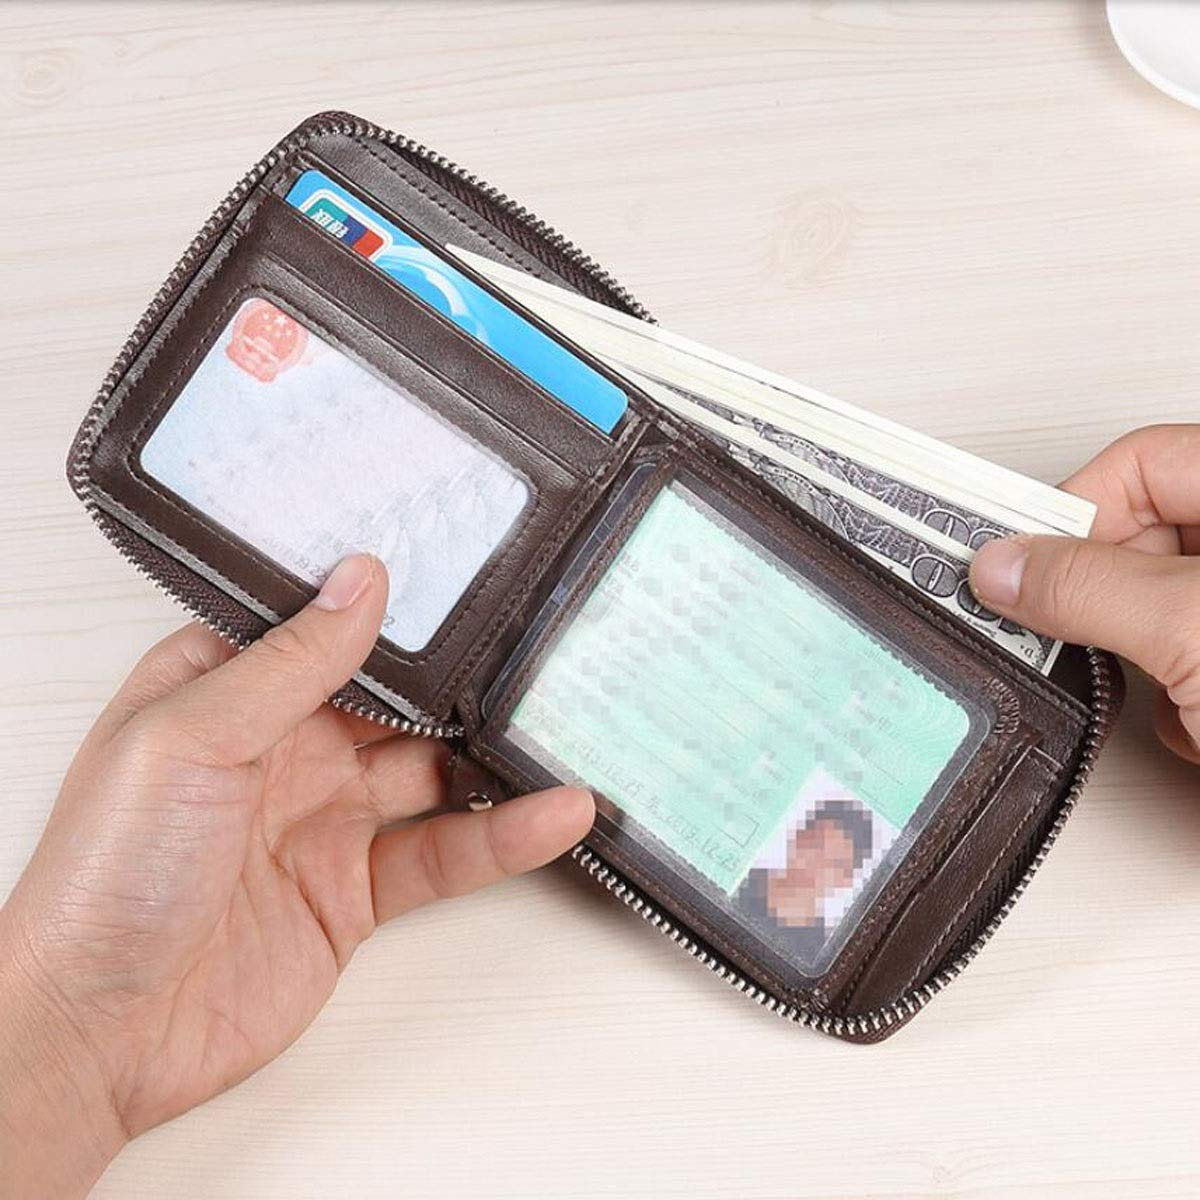 11 2.5 9.5 Color Kalmar RFID Travel Wallet cm Stealth Mode Blocking Leather Wallet Size, Suitable for Mens Short Casual Business Leather Wallet Black Color : Brown, Size : 112.59.5cm